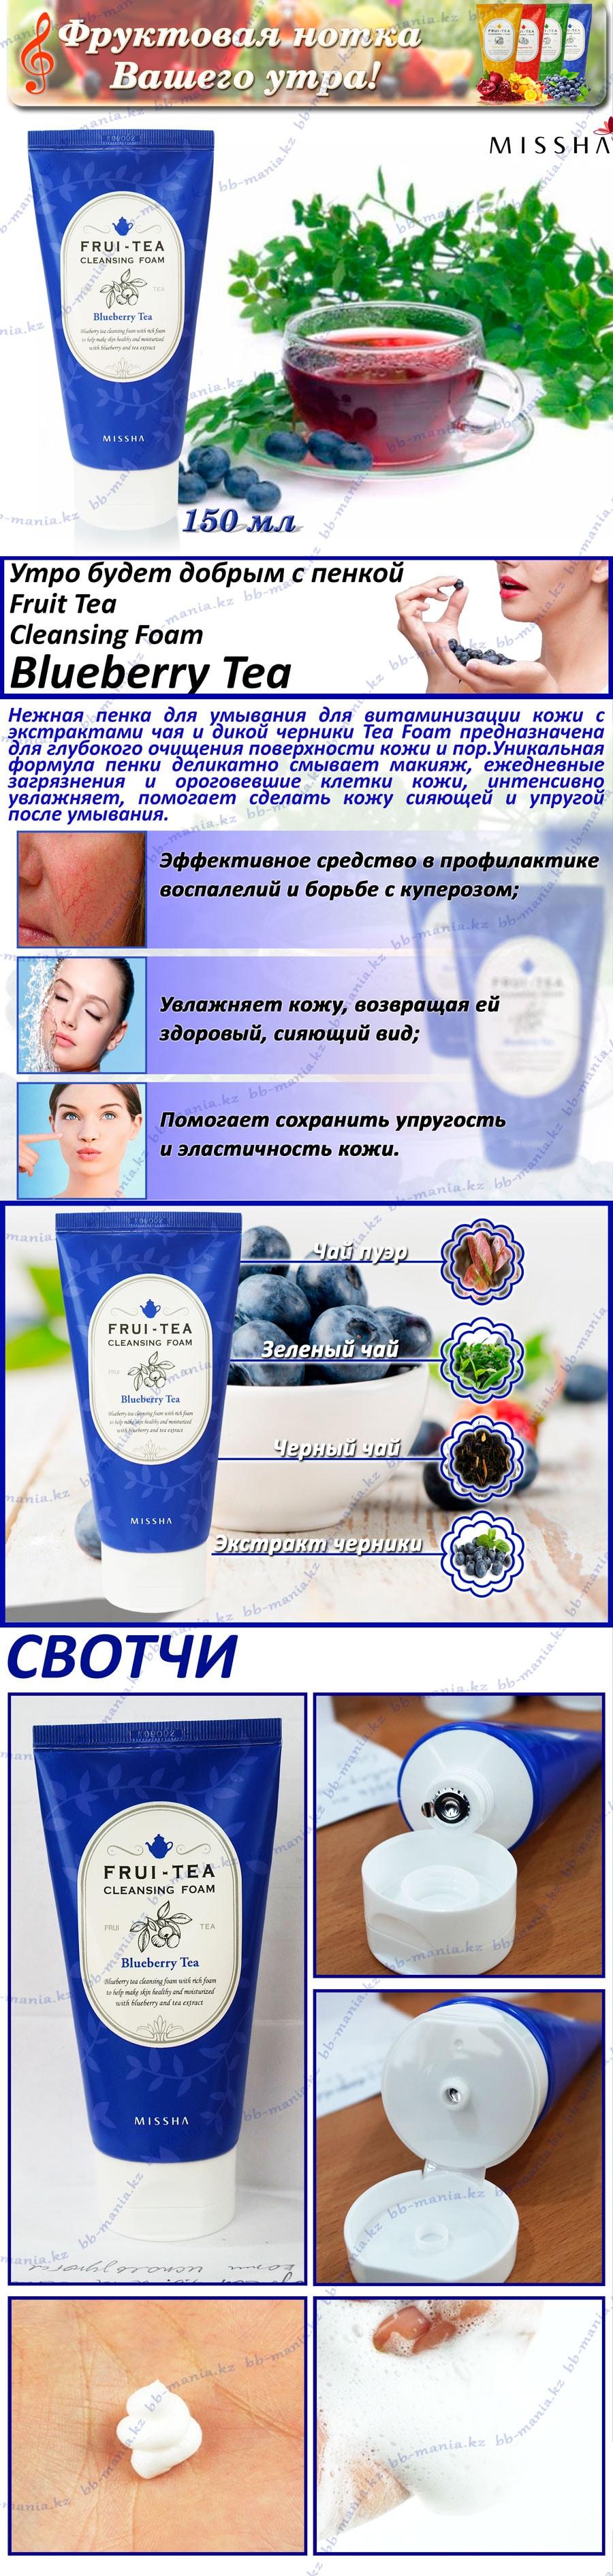 Missha-Fruit-Tea-Cleansing-Foam-—-Blueberry-Tea-min